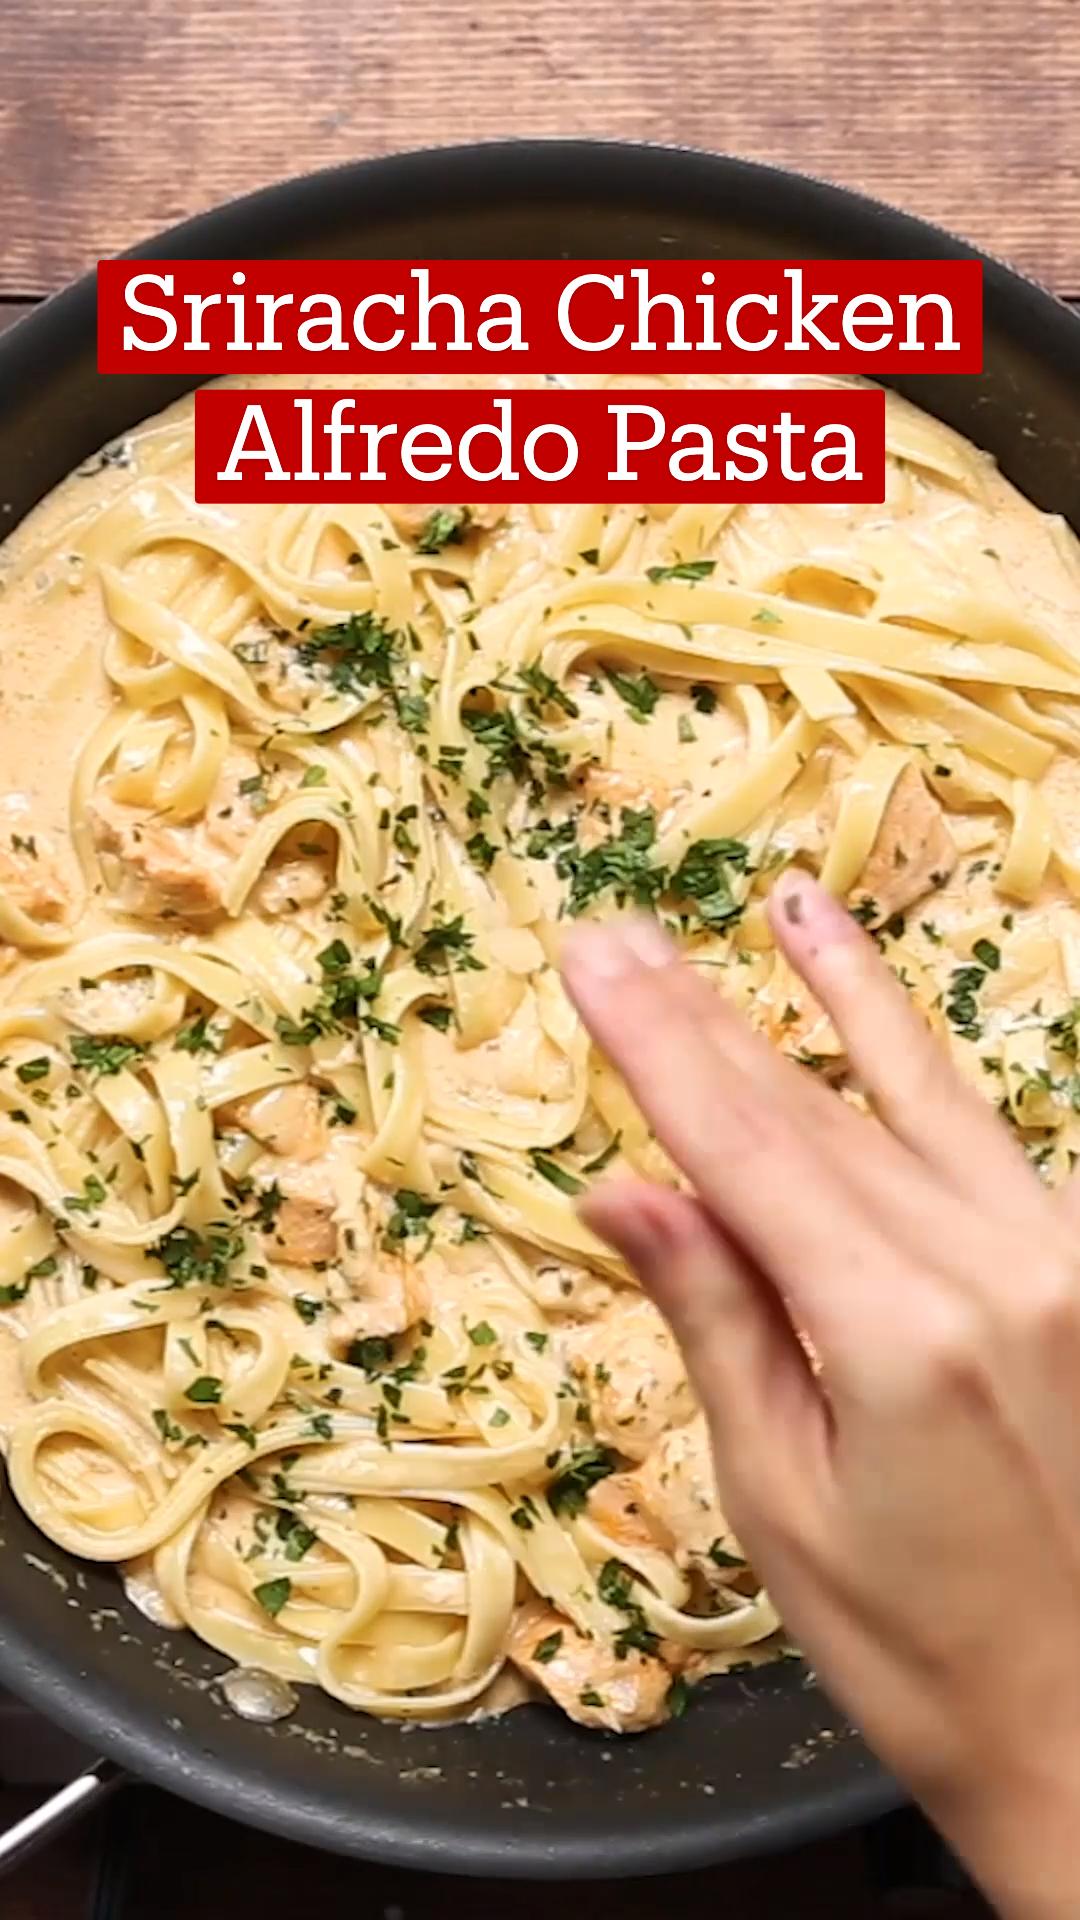 Sriracha Chicken Alfredo Pasta